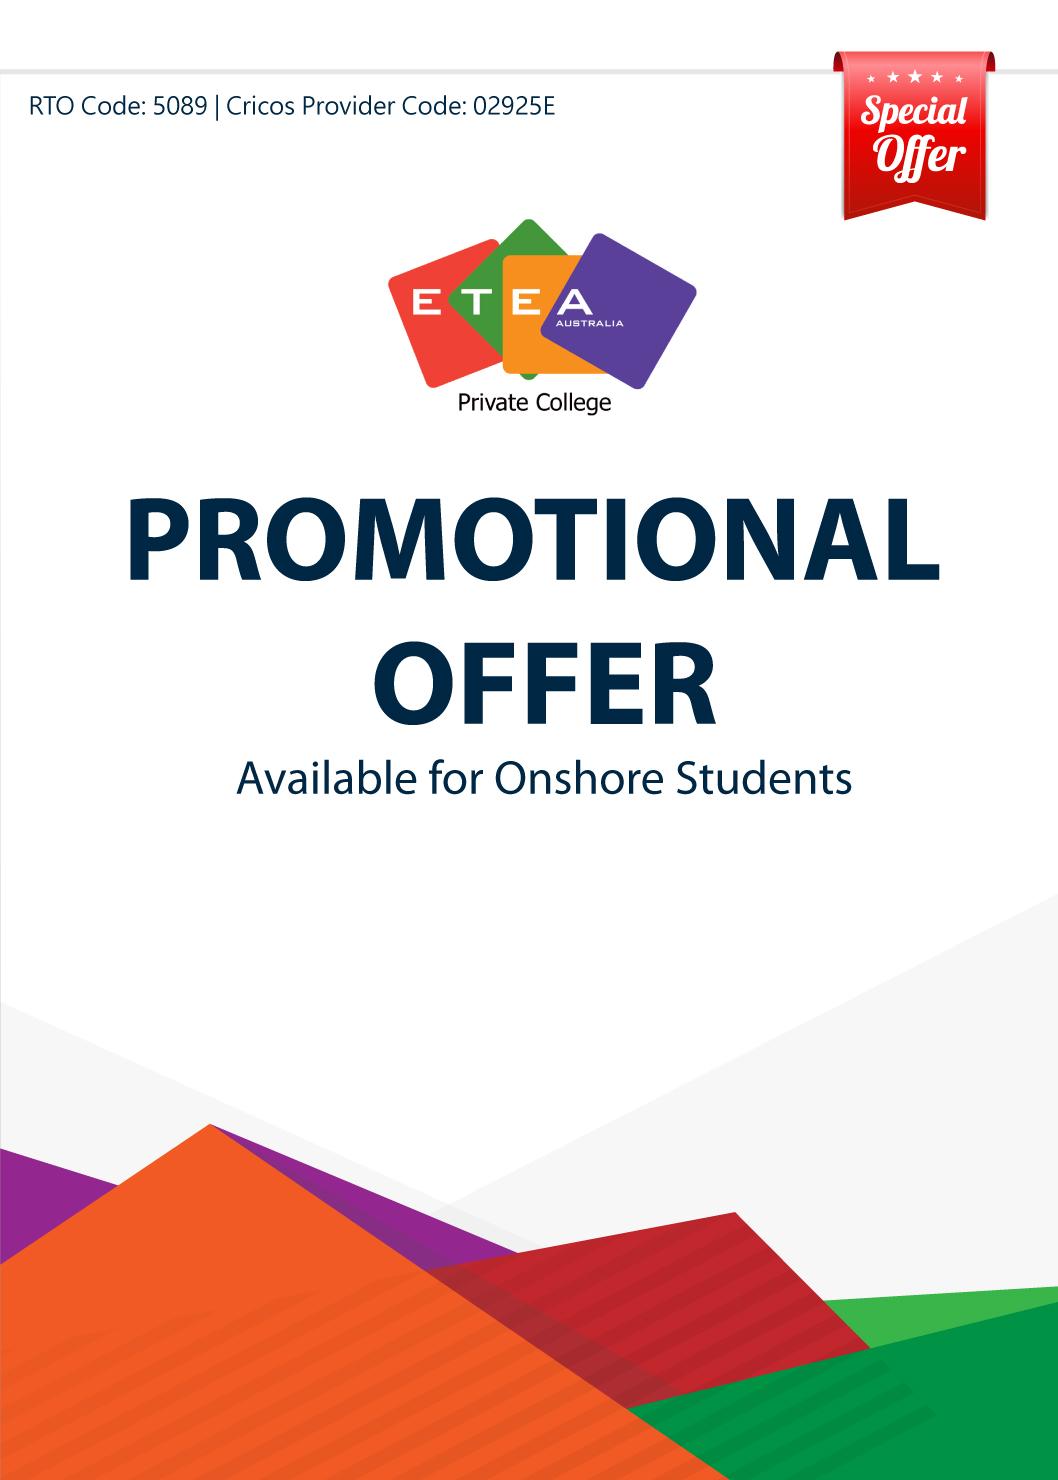 ETEA - Education Training & Employment Australia